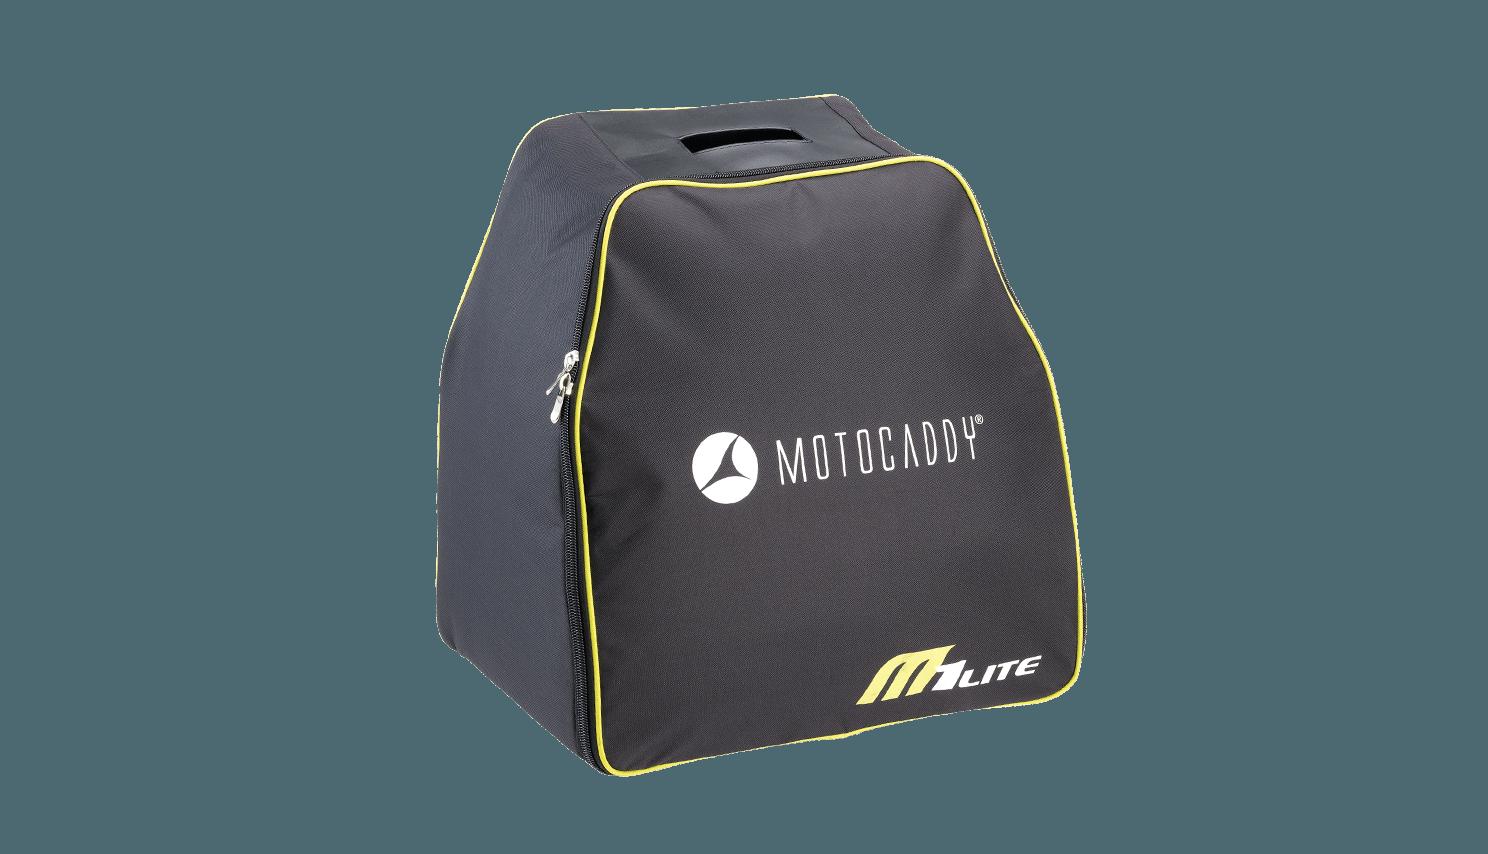 Motocaddy M1 Lite Travel Cover Scott S Golf Trolleys